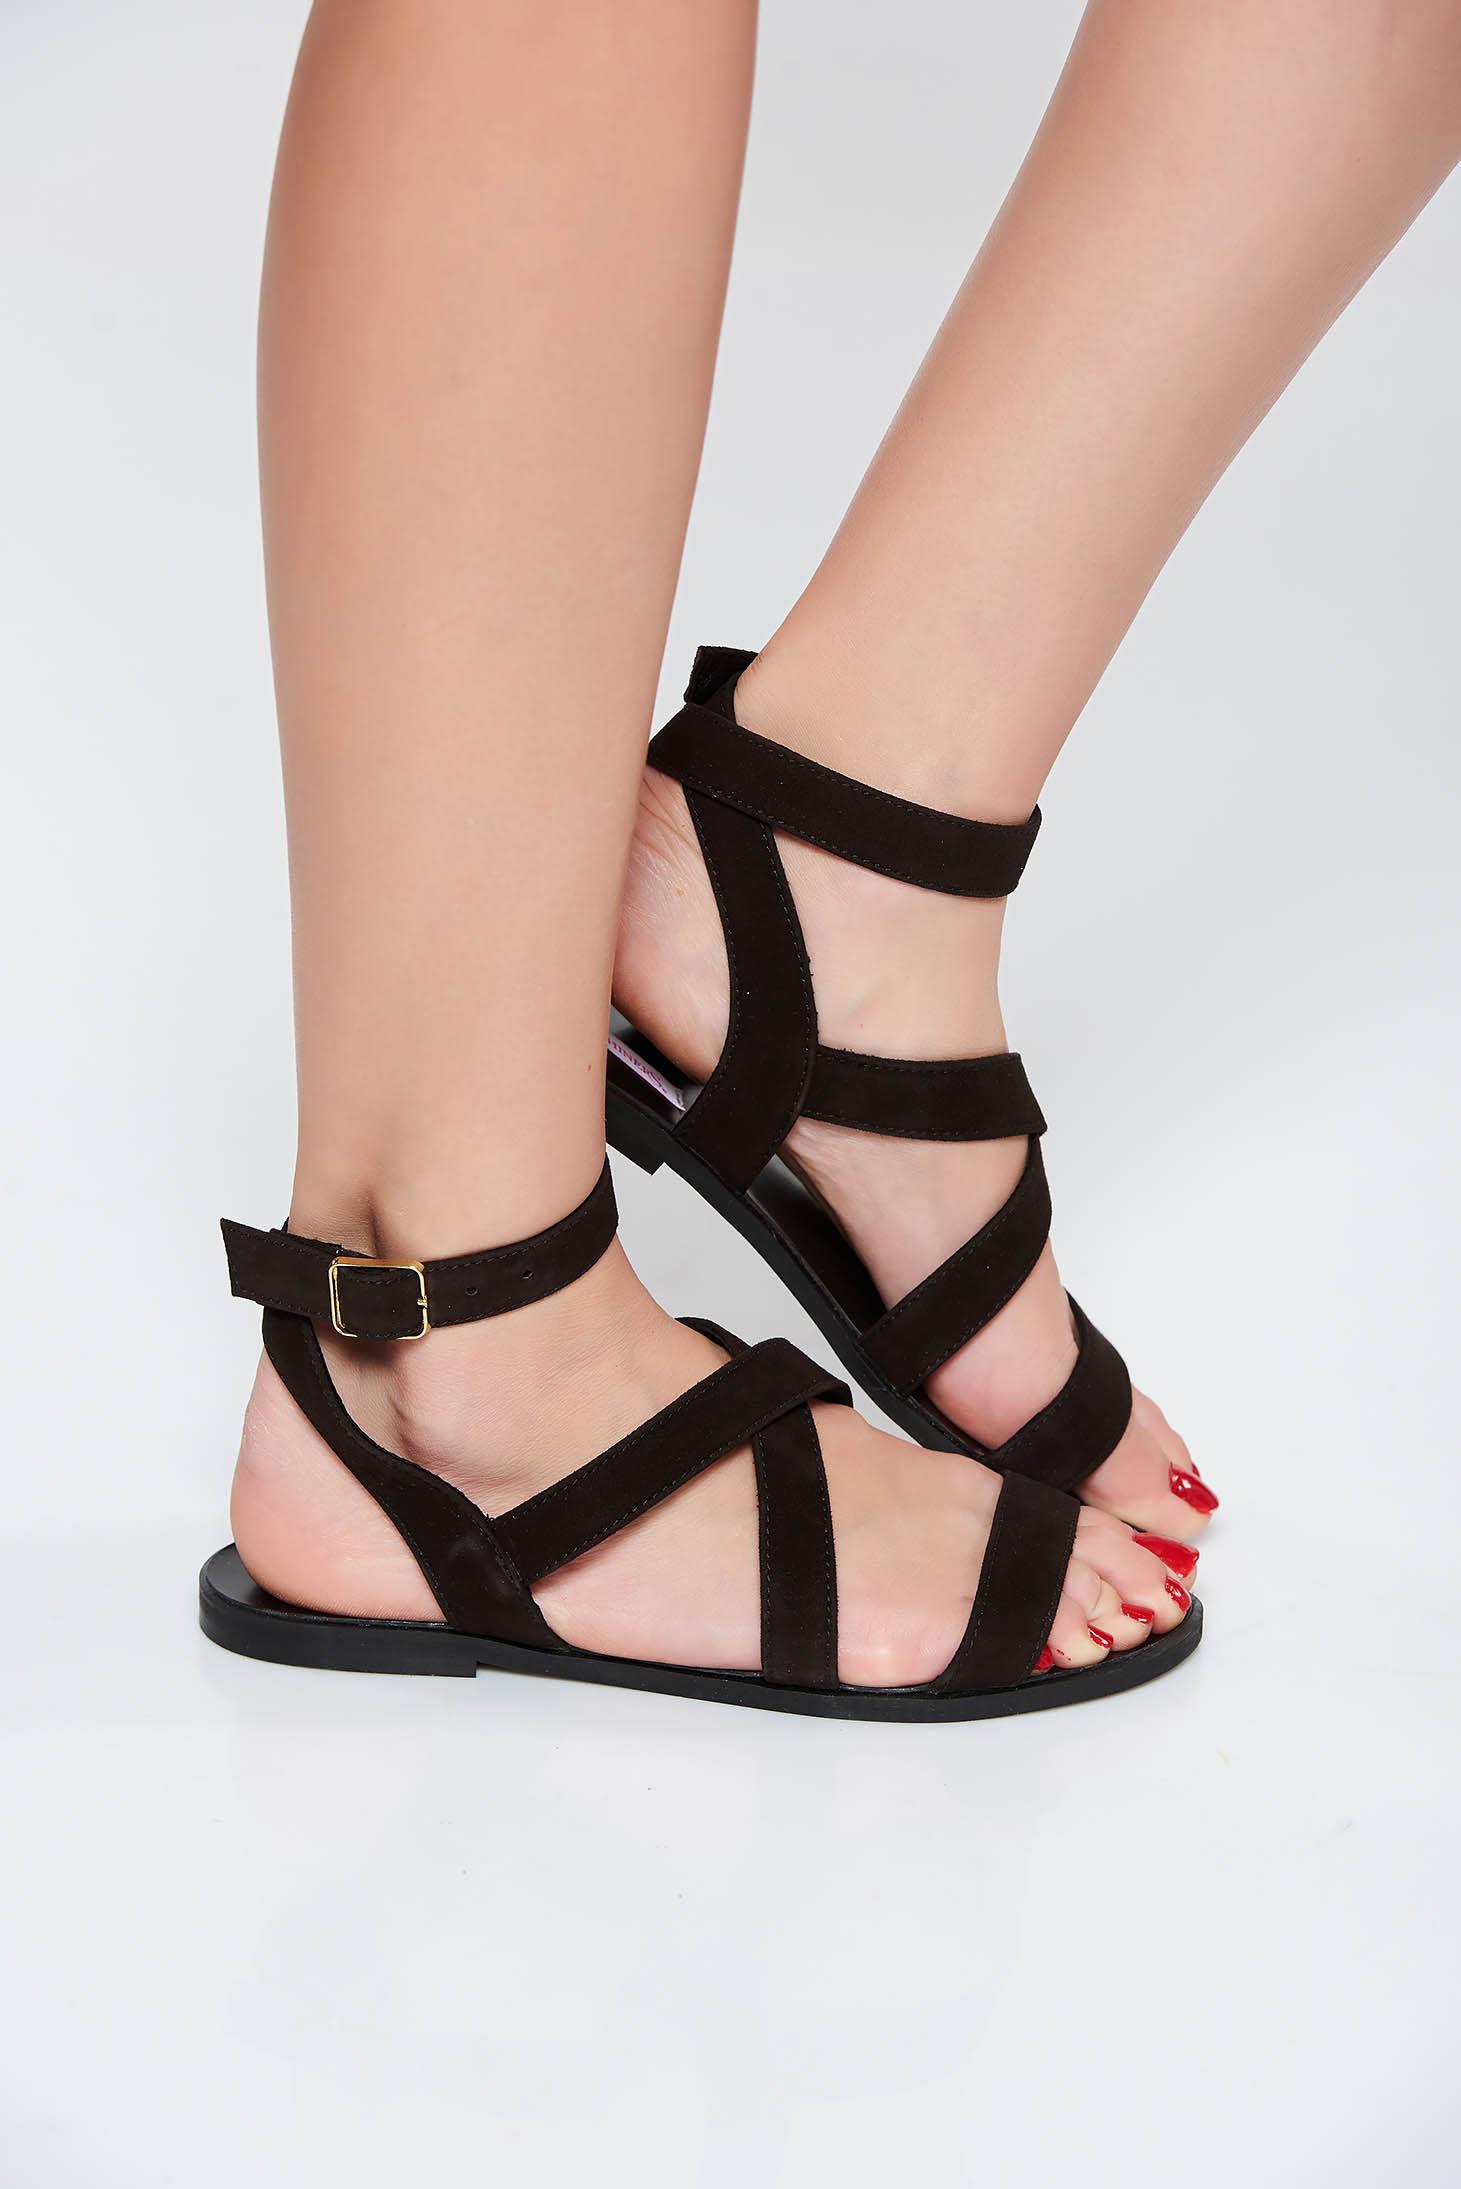 Sandale StarShinerS negre casual din piele naturala cu talpa joasa si barete subtiri